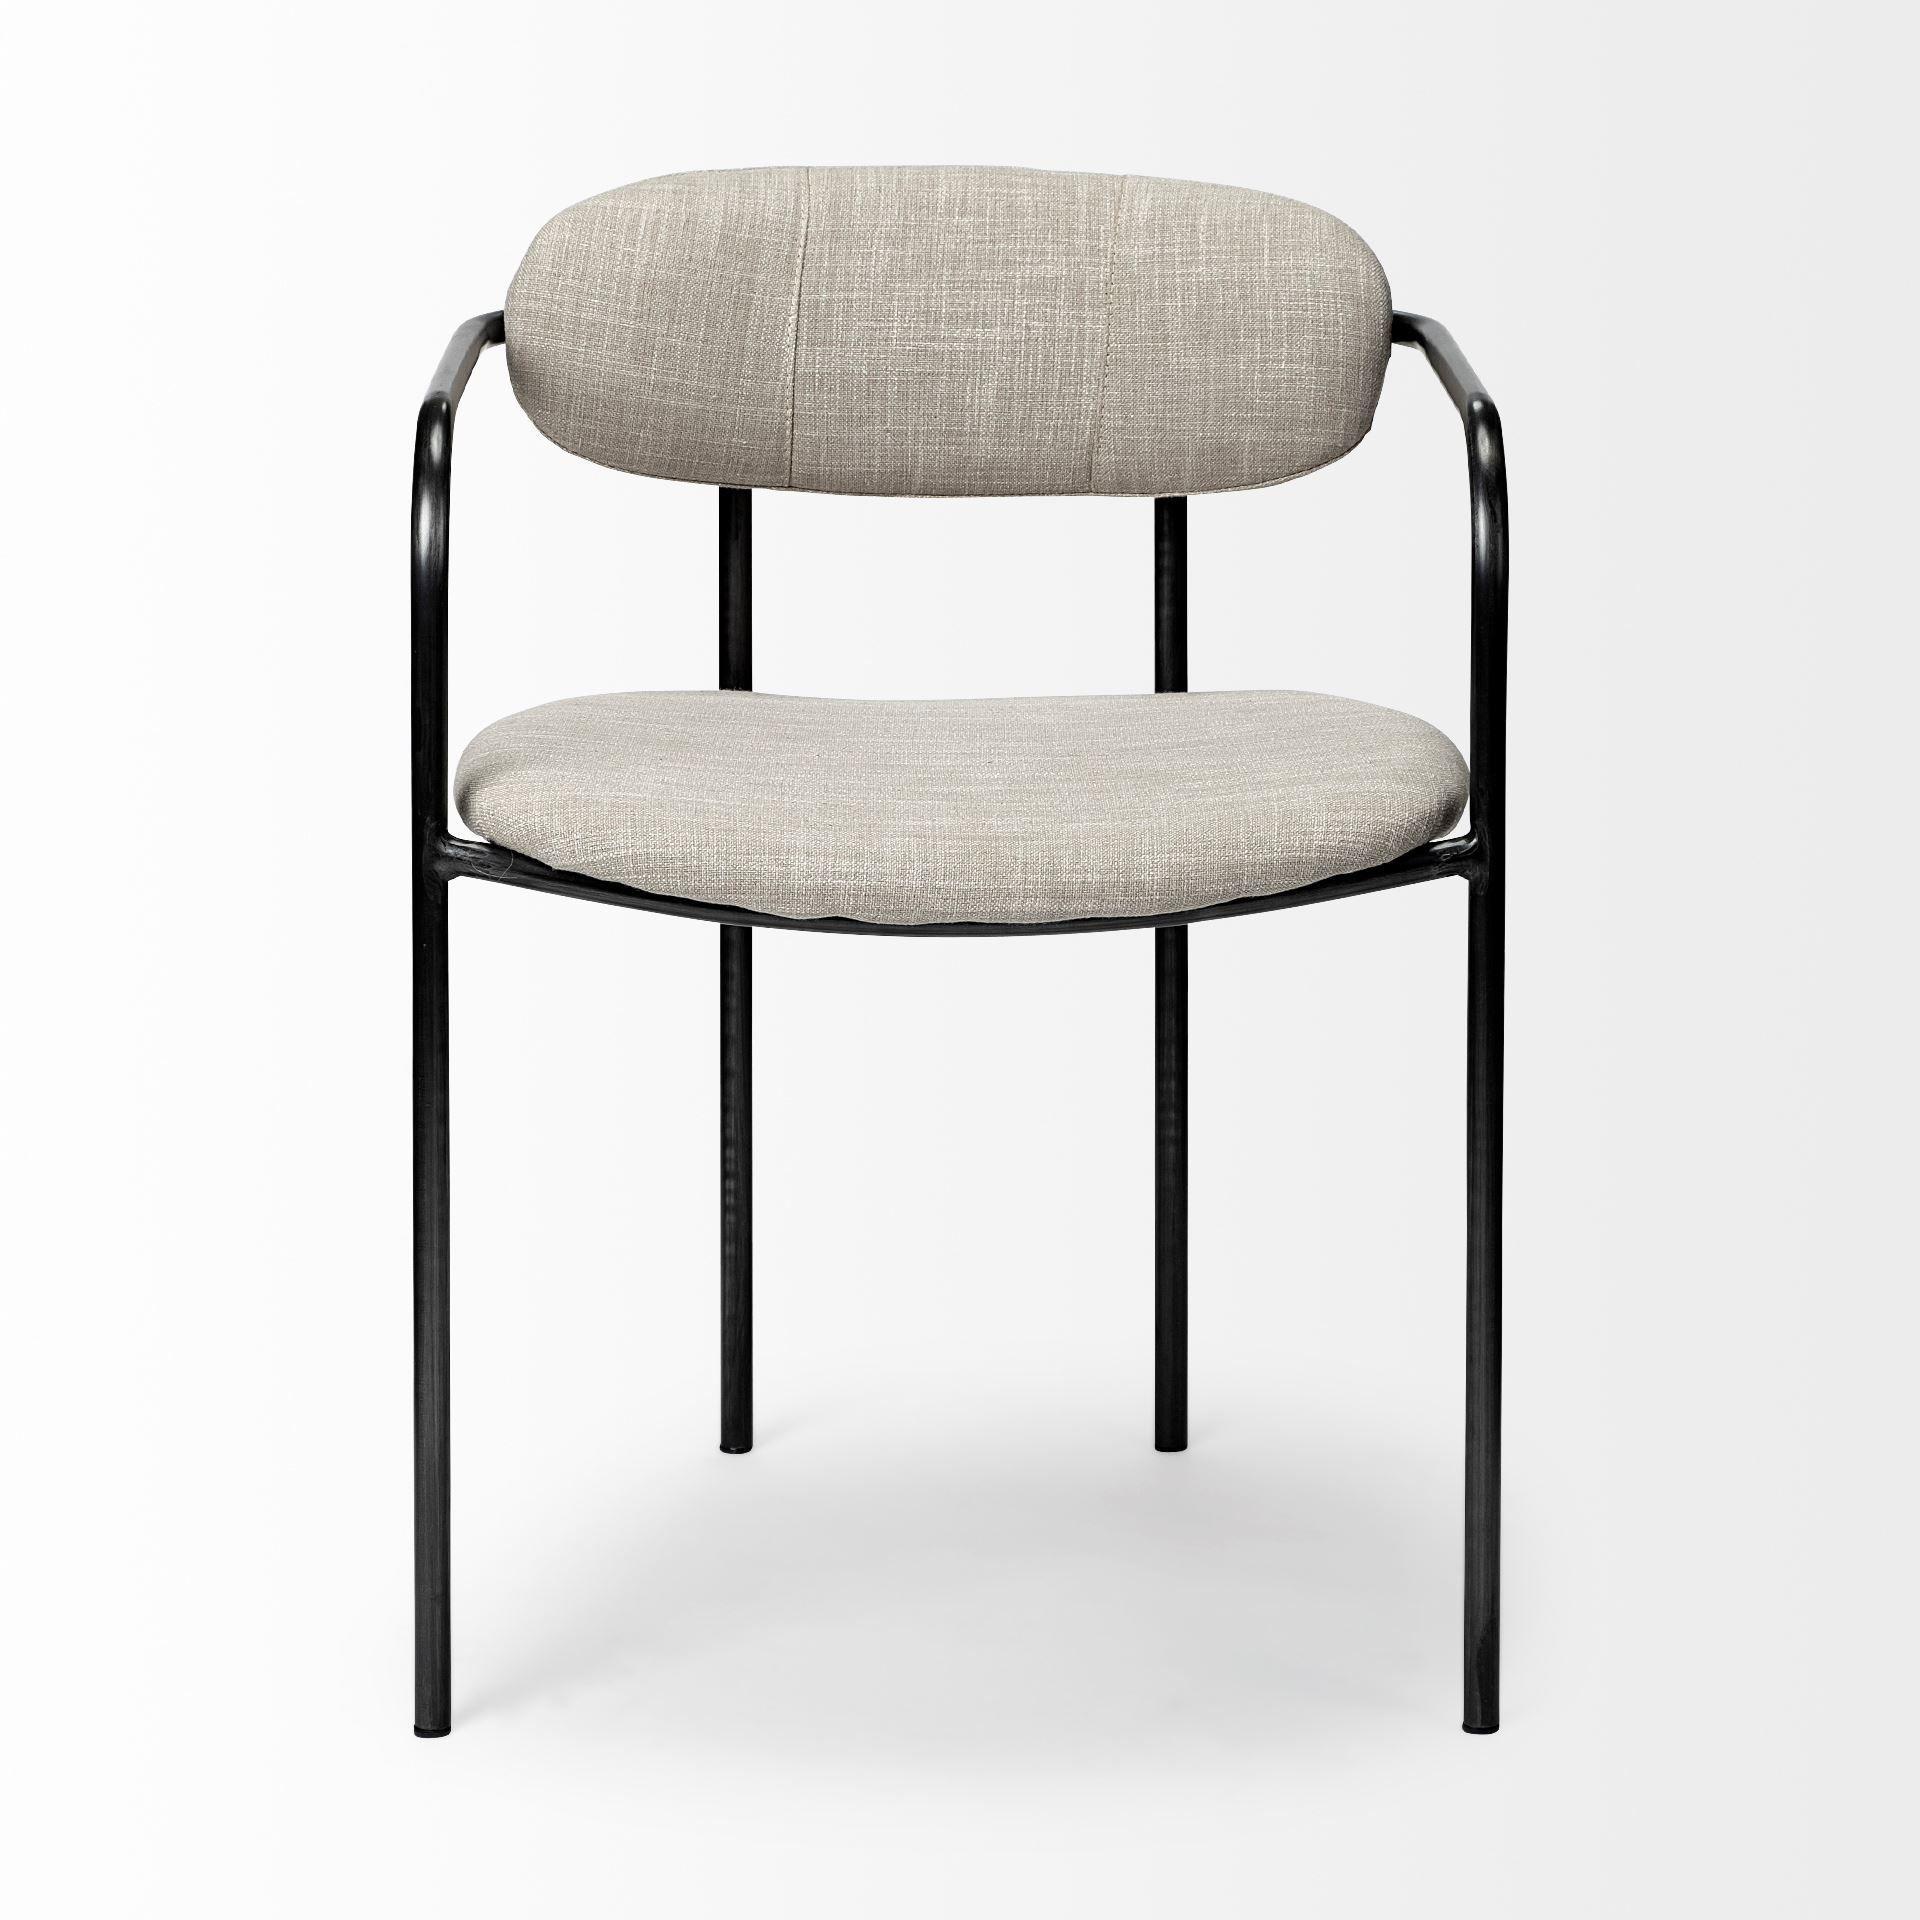 Parker Dining Chair - Beige & Grey